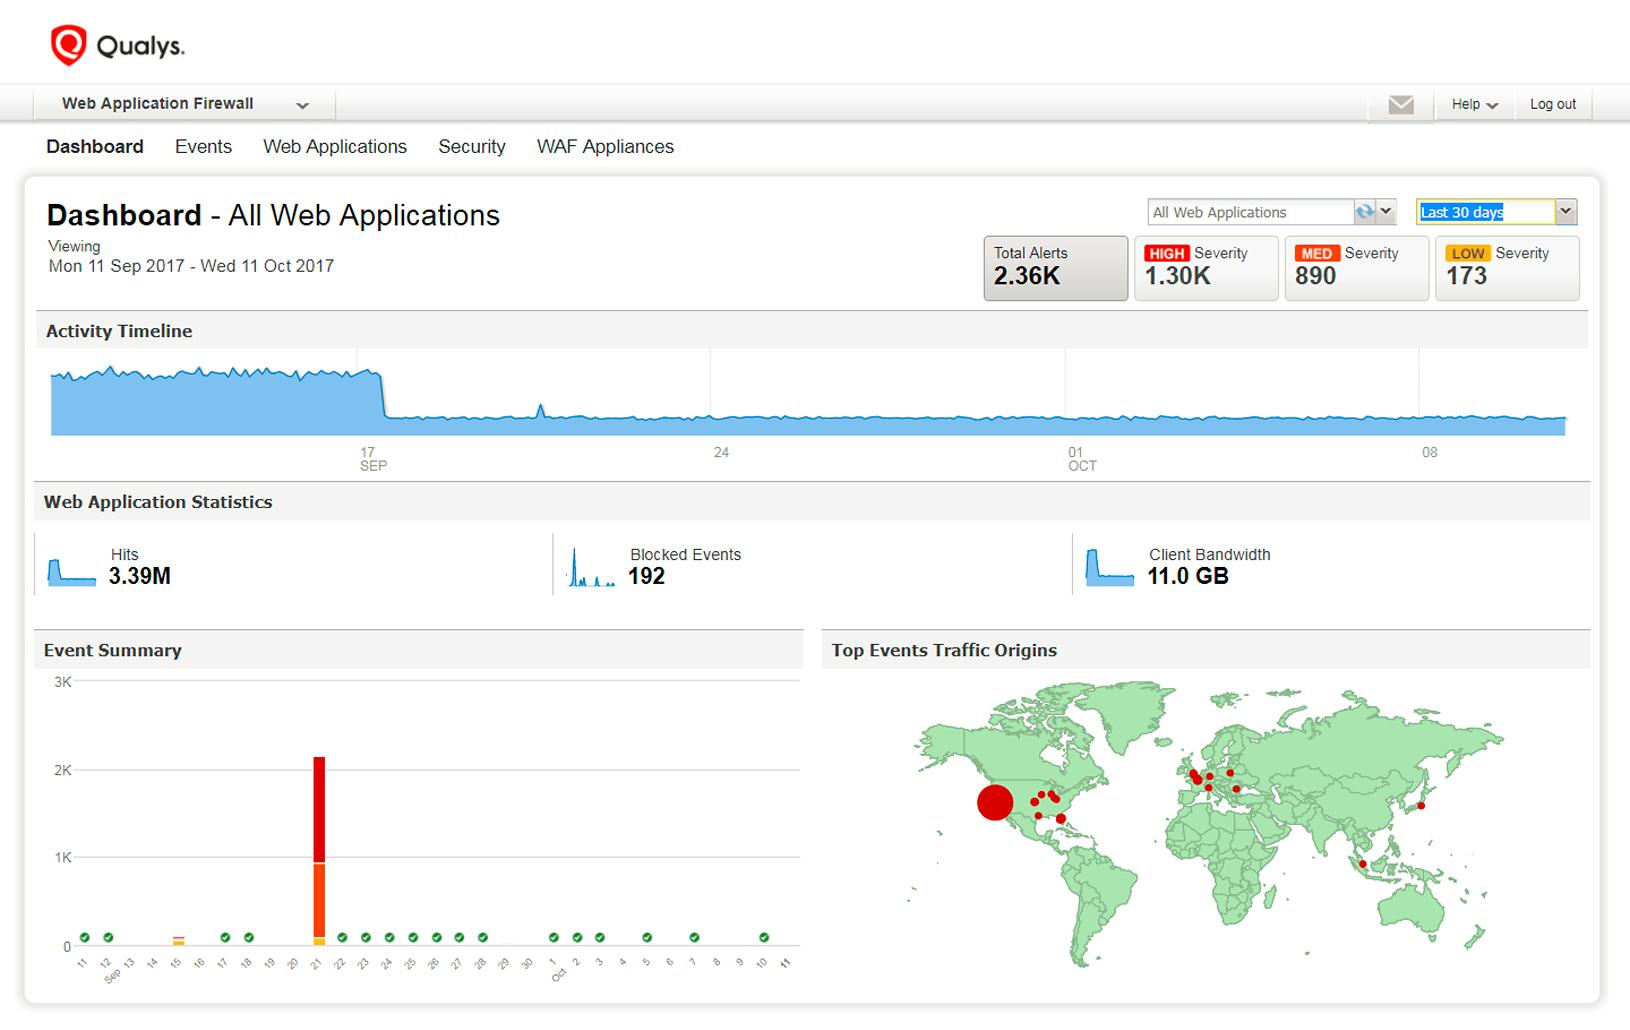 Qualys Cloud Platform web application firewall